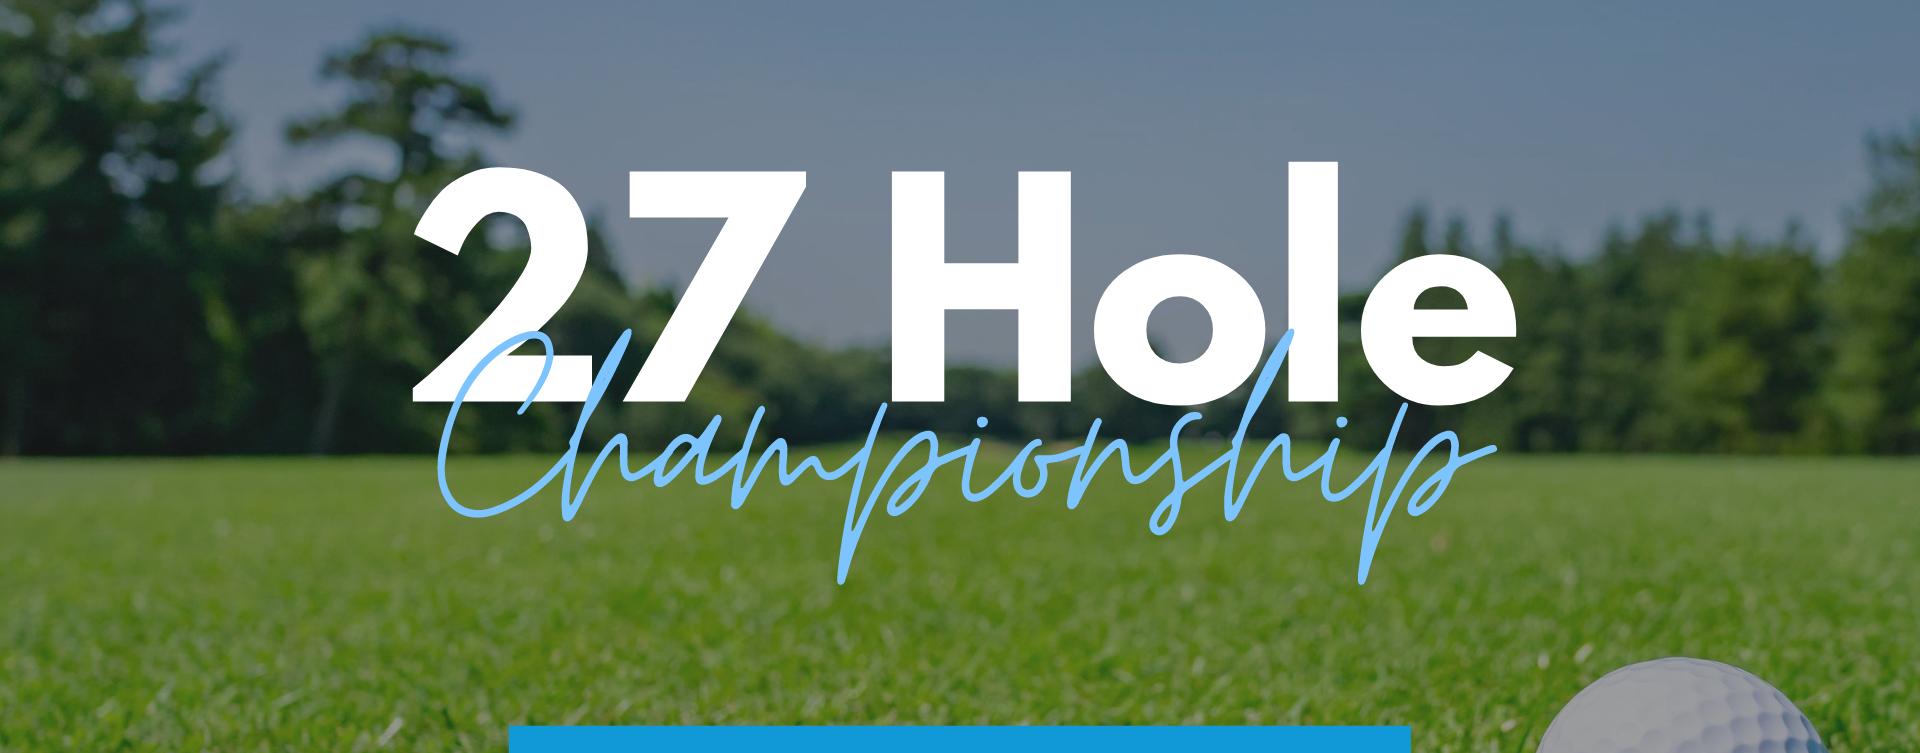 Diamond Woods 2 Person Team 27 Hole Championship!